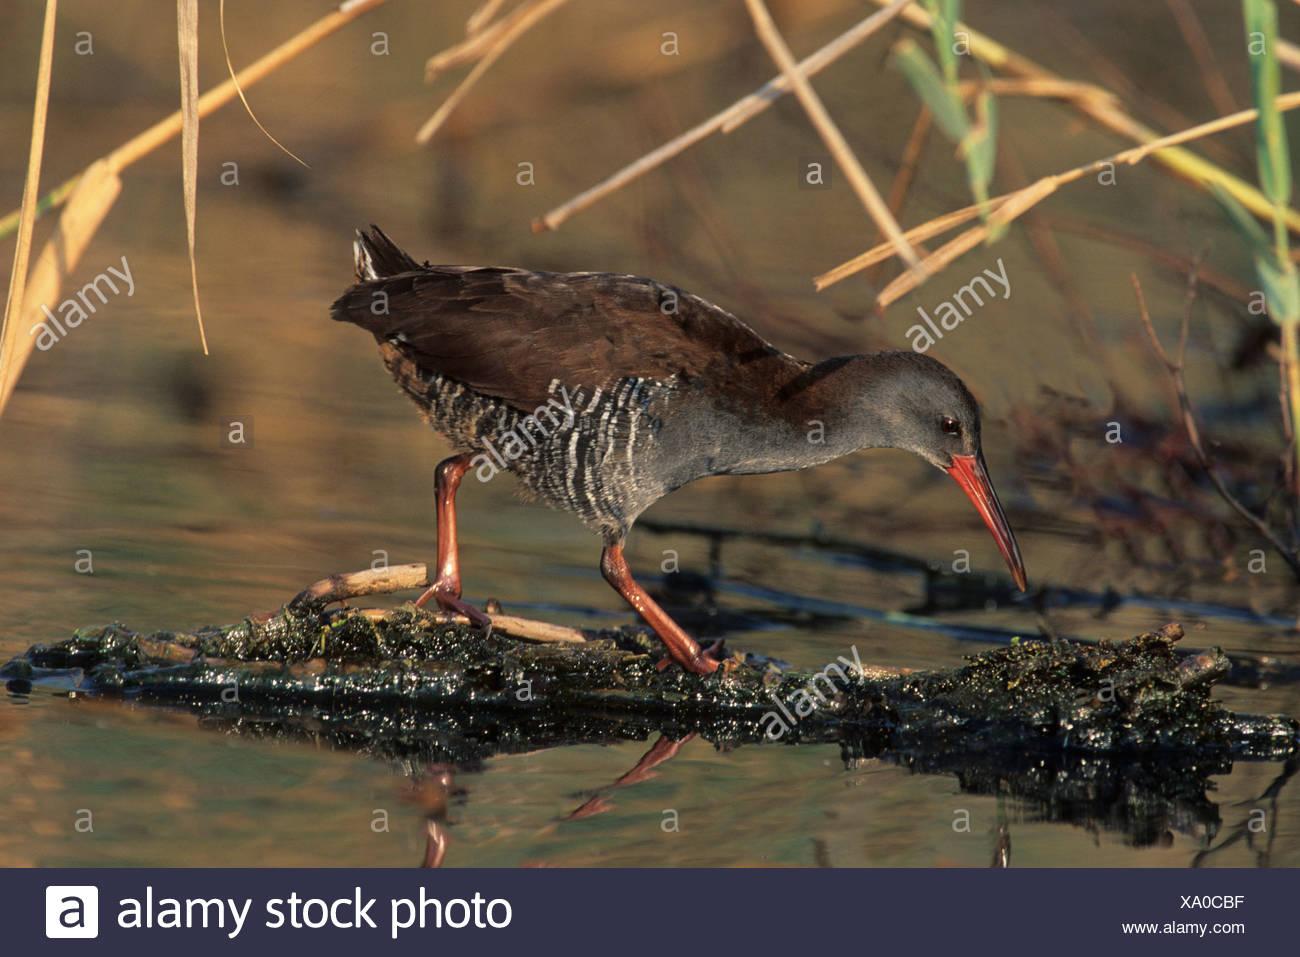 African Rail (Rallus caerulescens), in marsh habitat, Gauteng, South Africa, Africa - Stock Image